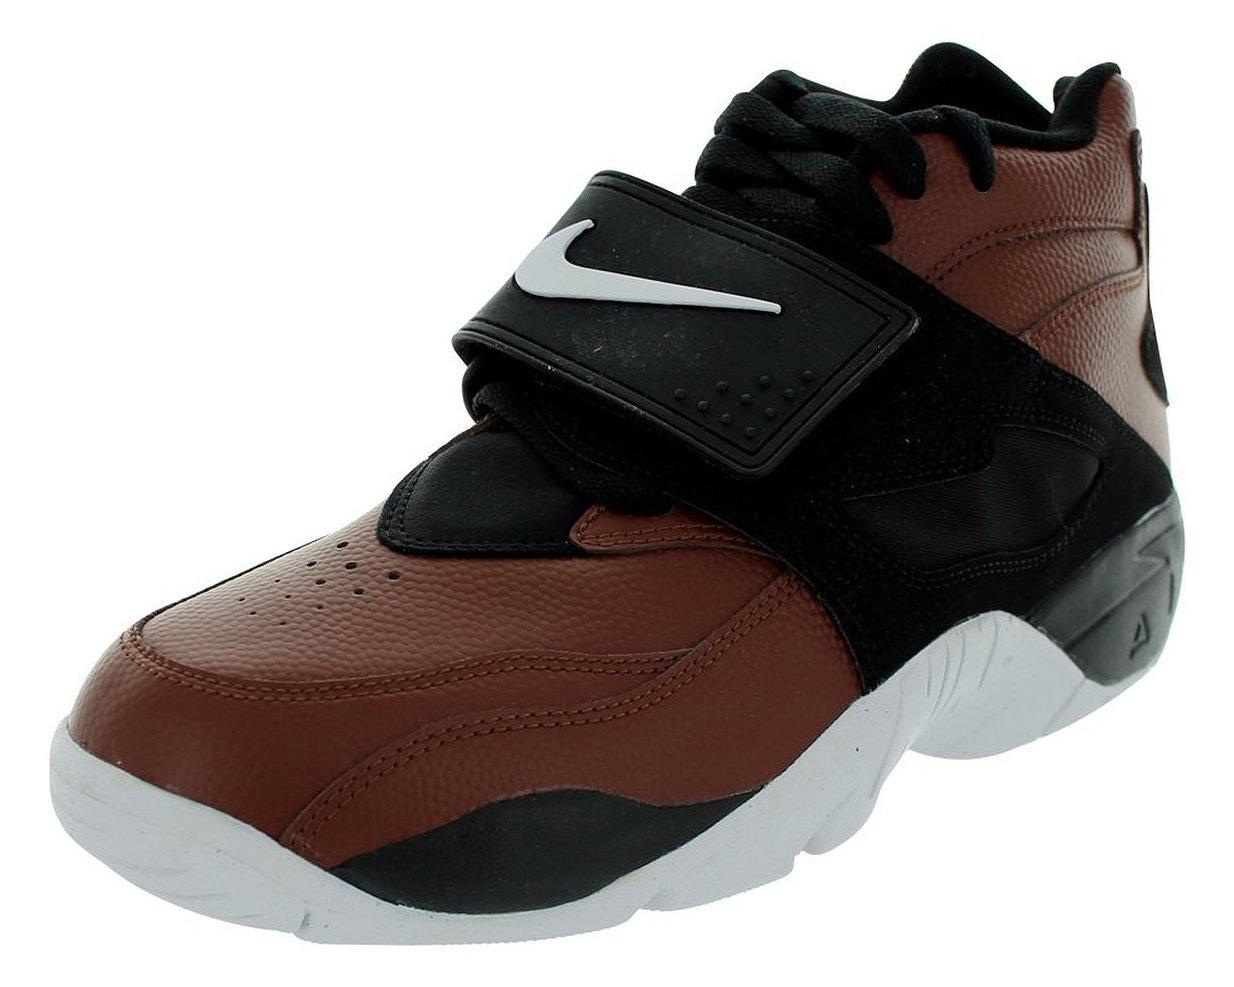 NIKE Men's Air Diamond Turf Field Brown/White/Black Size 9.5 by Nike (Image #1)